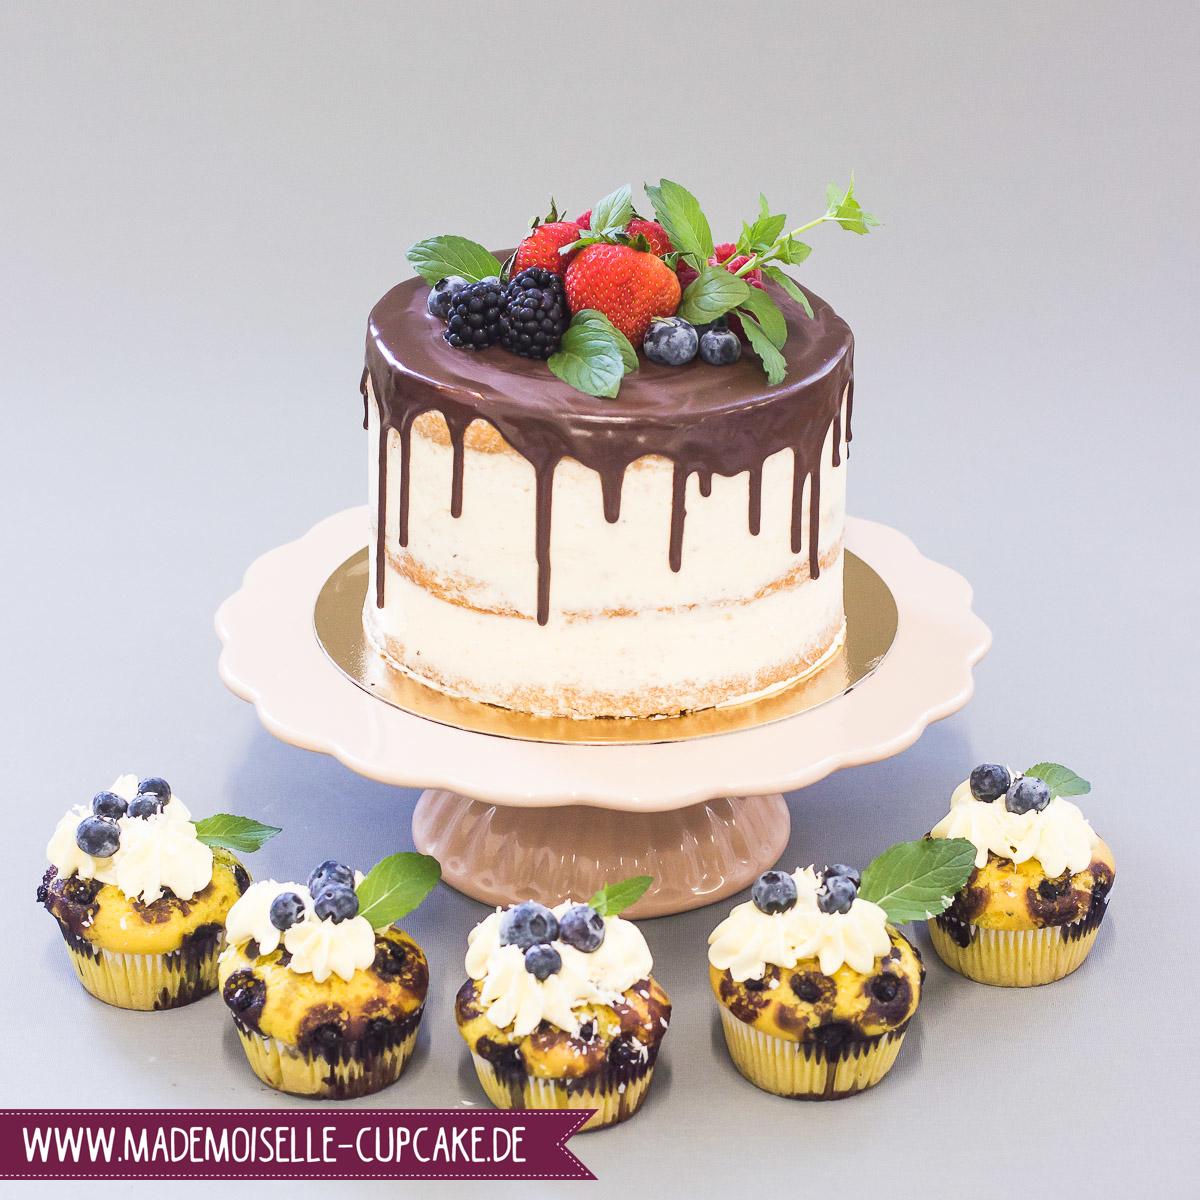 Drip Cake - Mademoiselle Cupcake